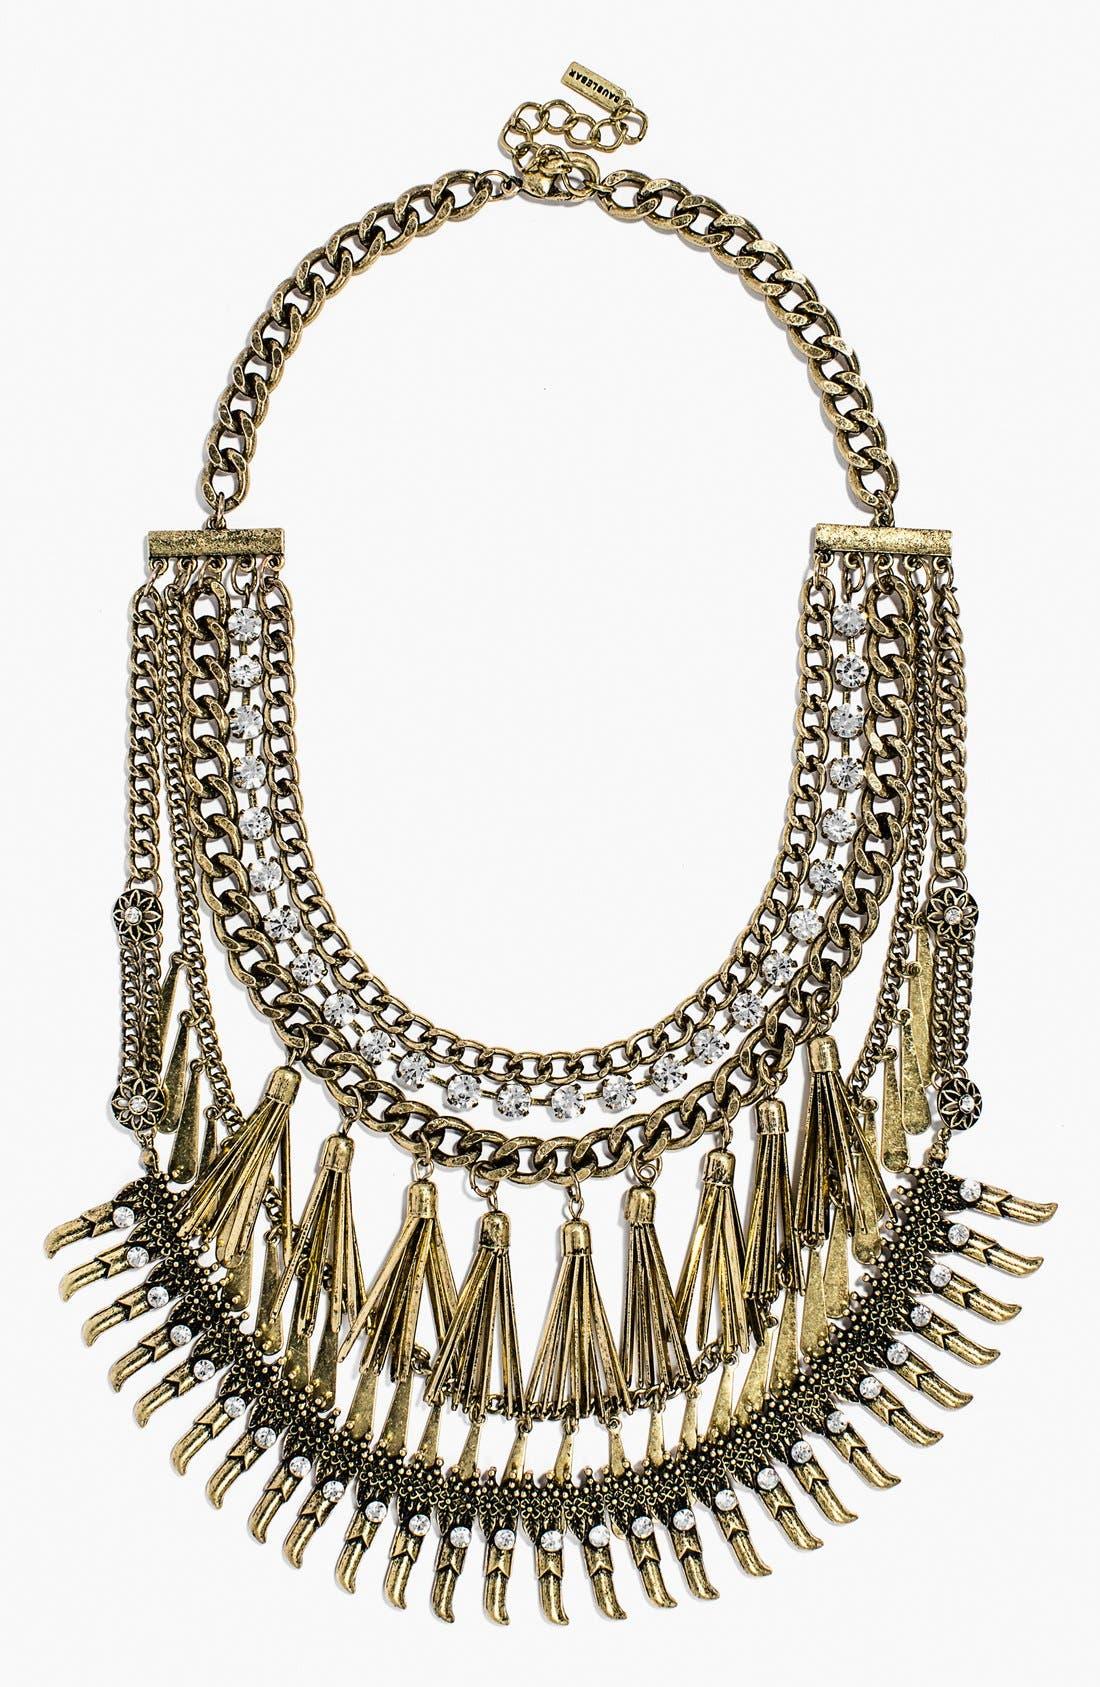 Alternate Image 1 Selected - BaubleBar 'Amazon' Bib Necklace